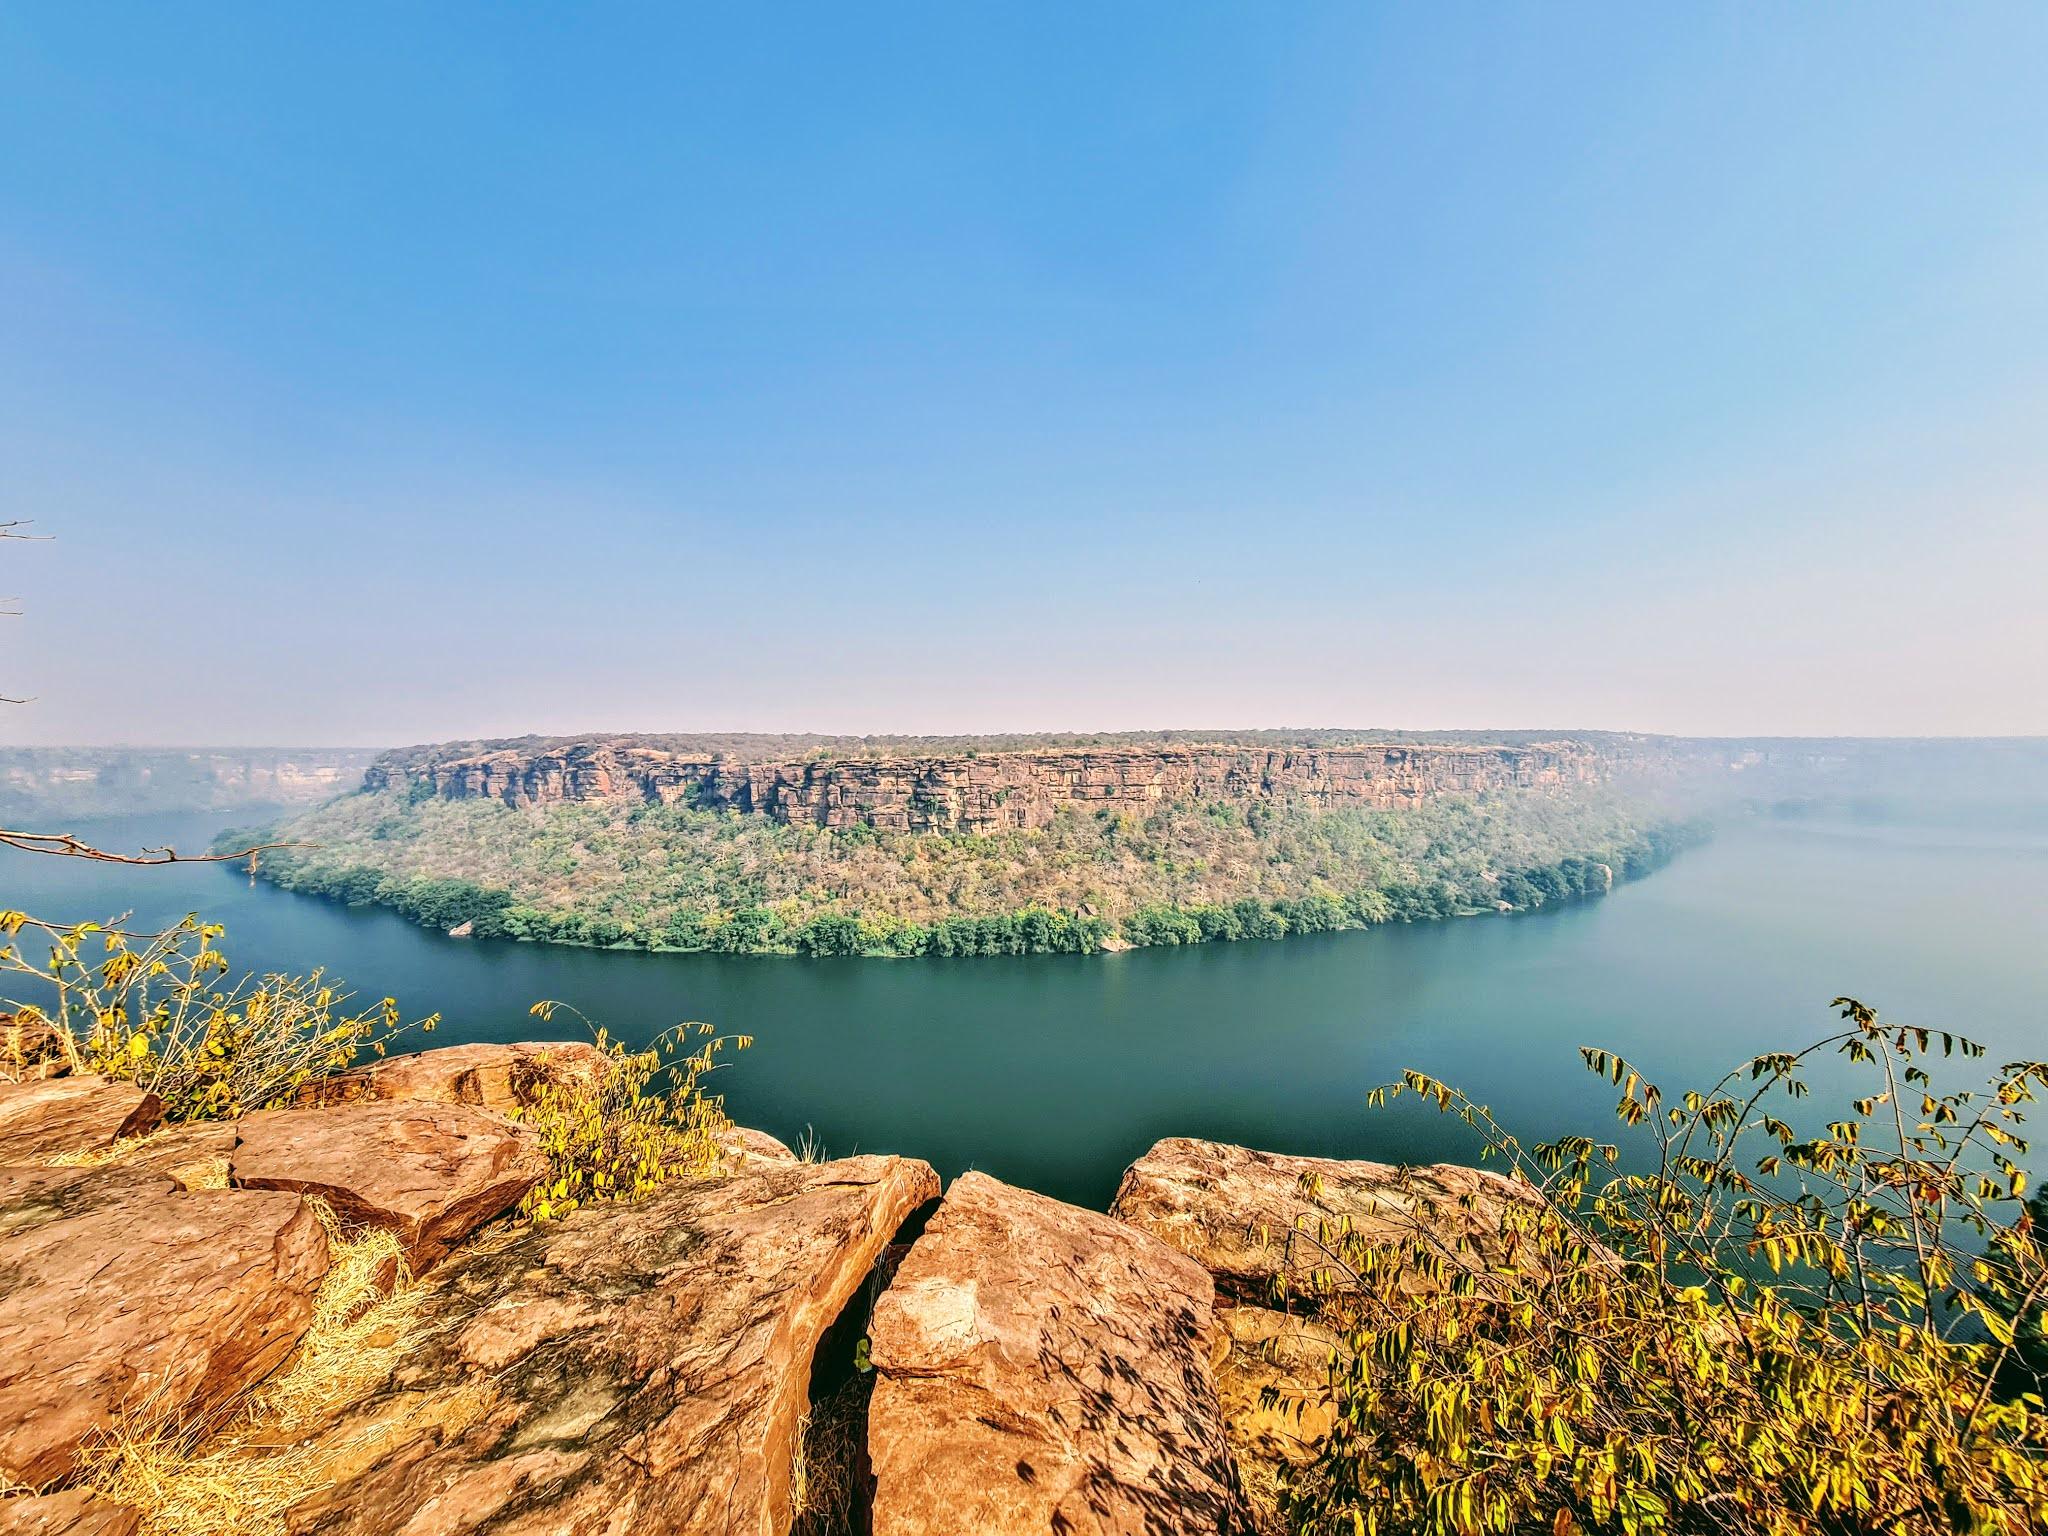 Garadia Mahadev Viewpoint